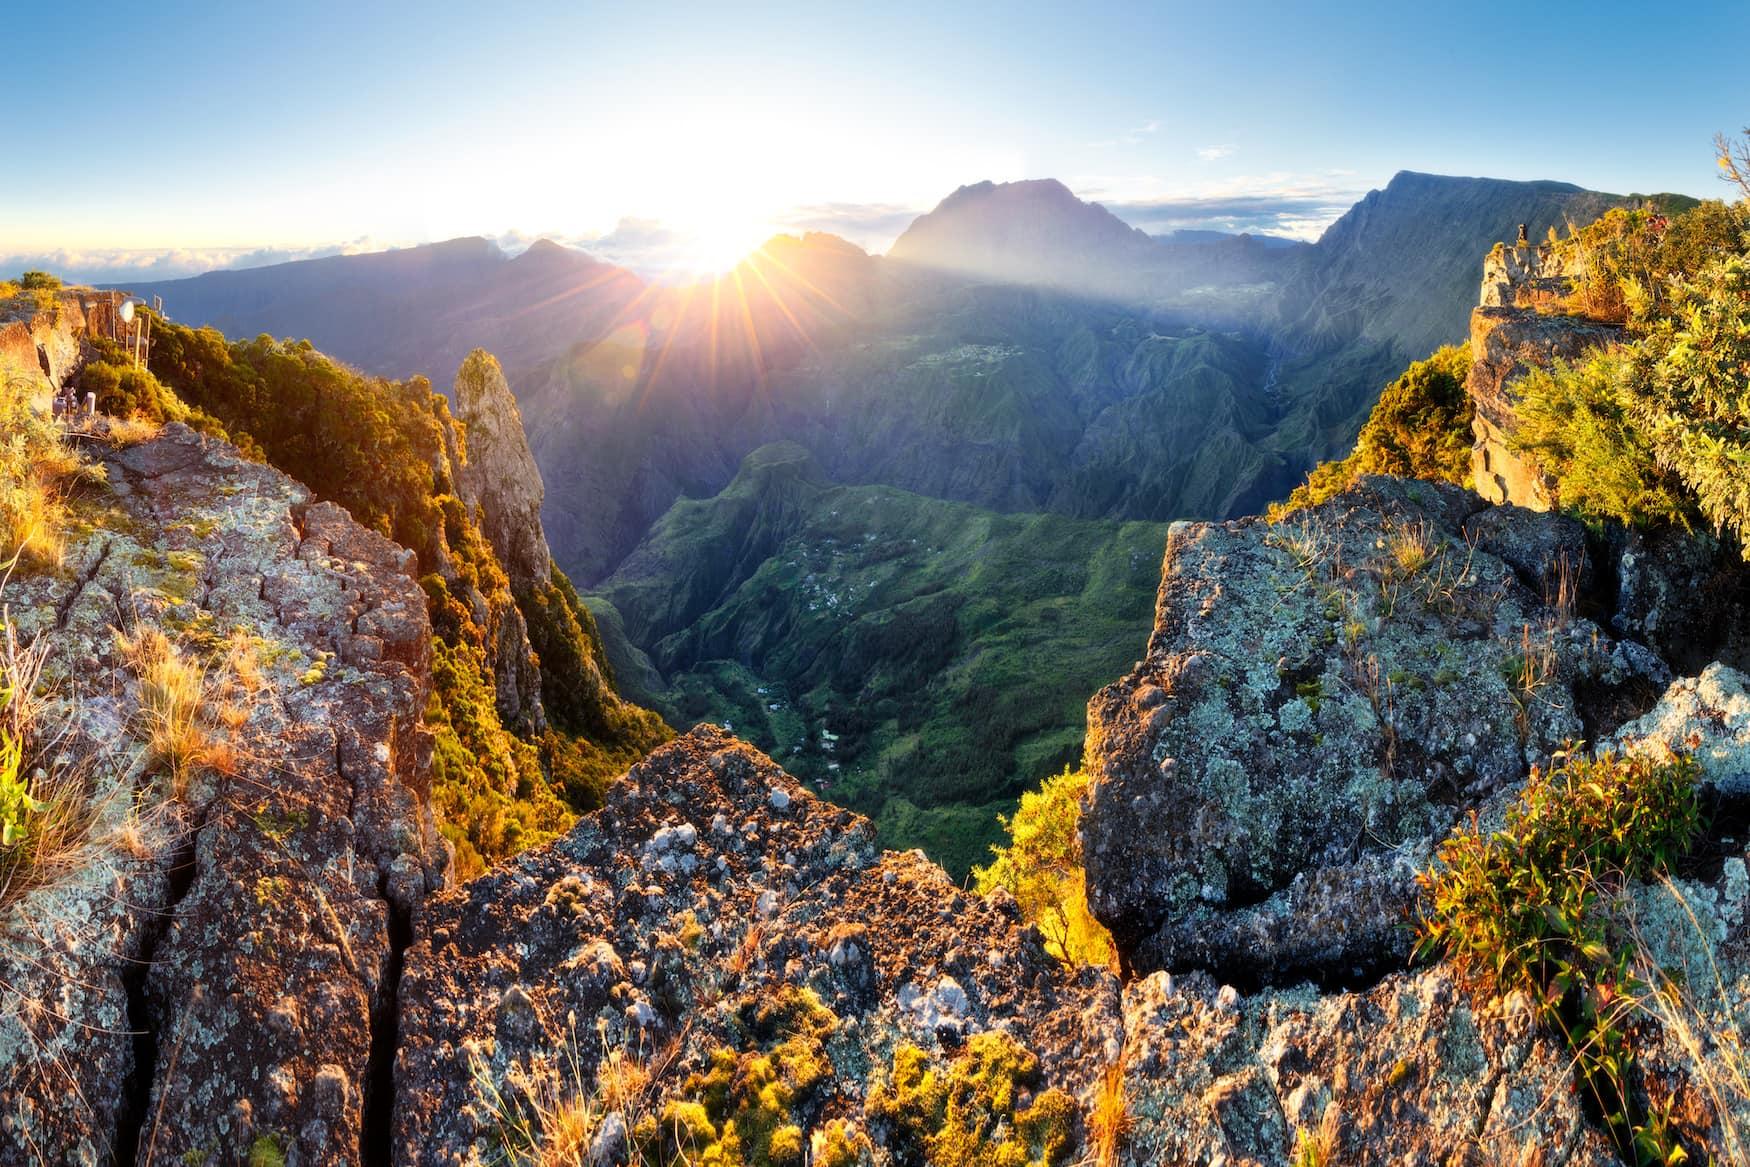 Blick auf Vulkankrater in La Reunion